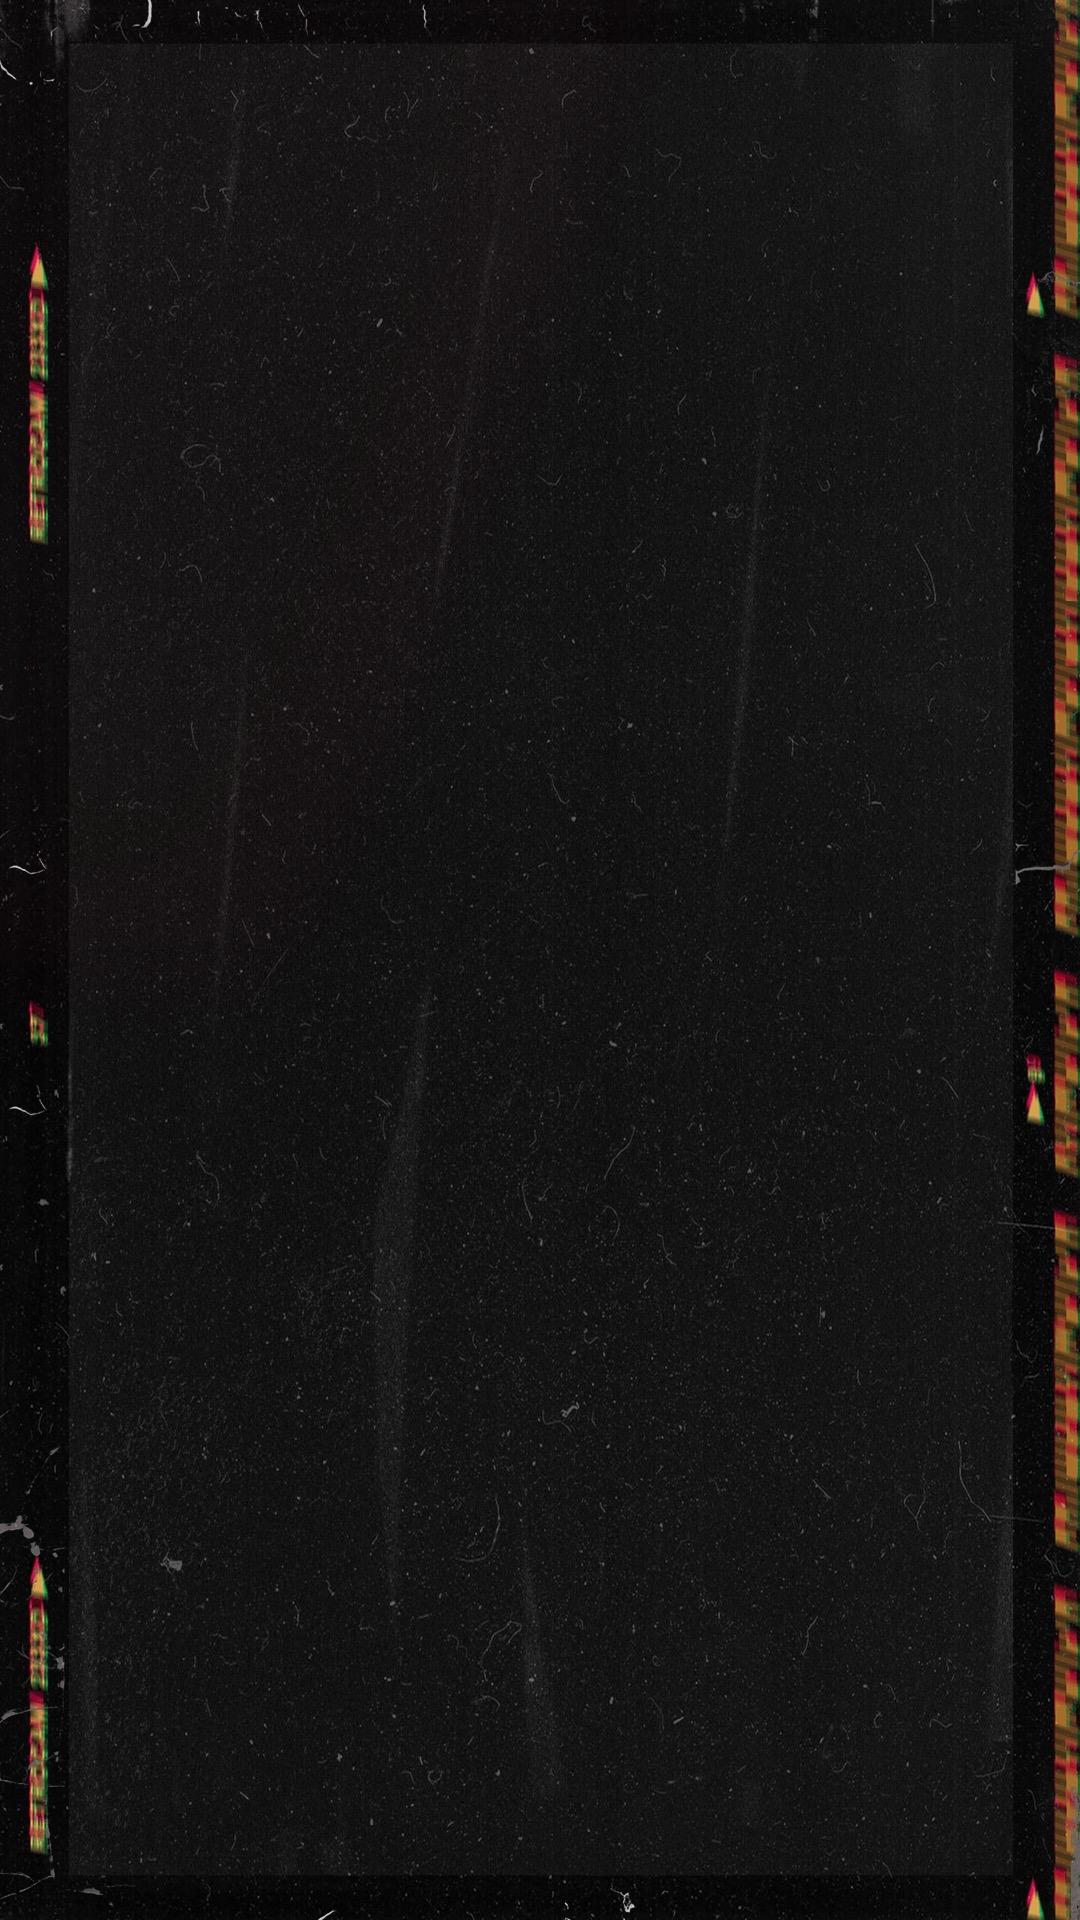 Dark Backgrounds 1 (JPG)